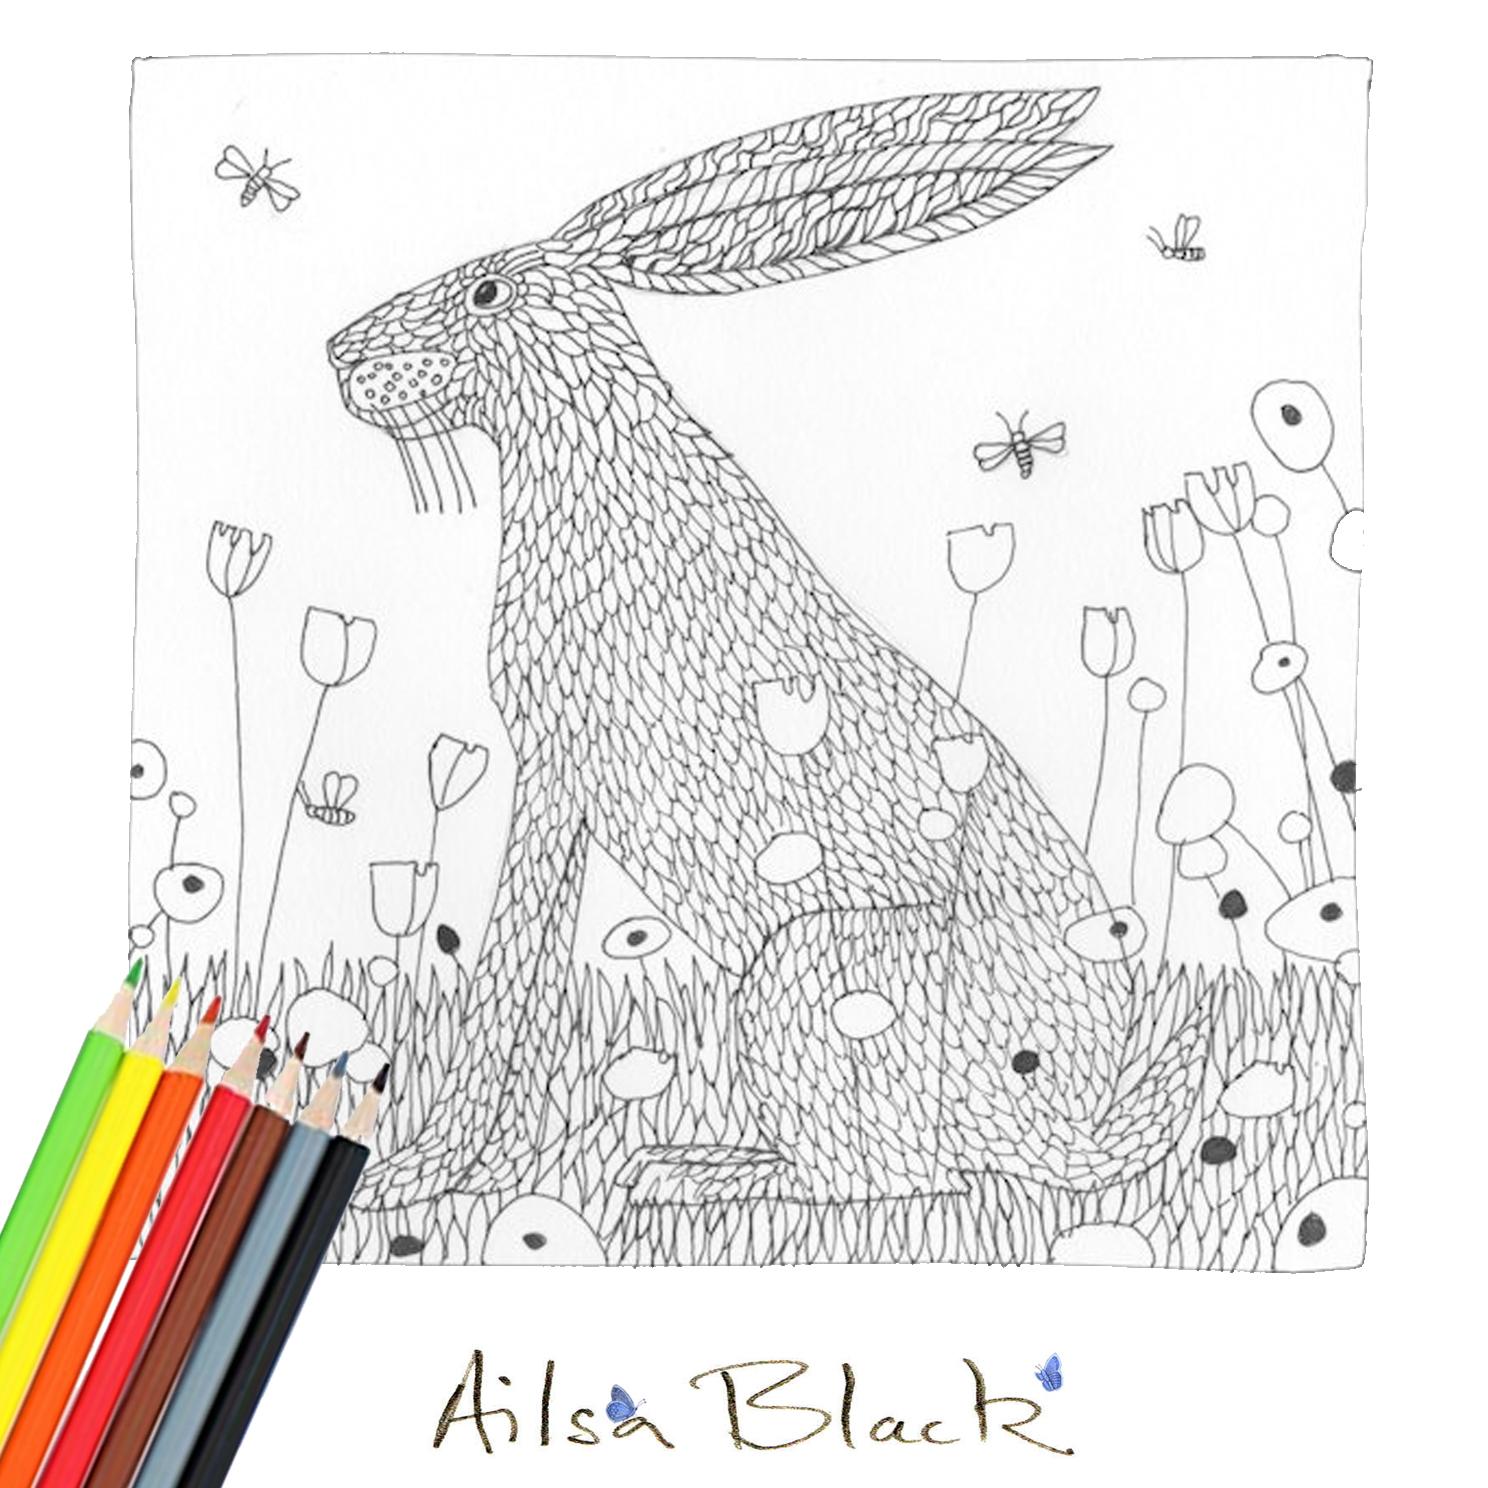 AILSA-BLACK_DAY9